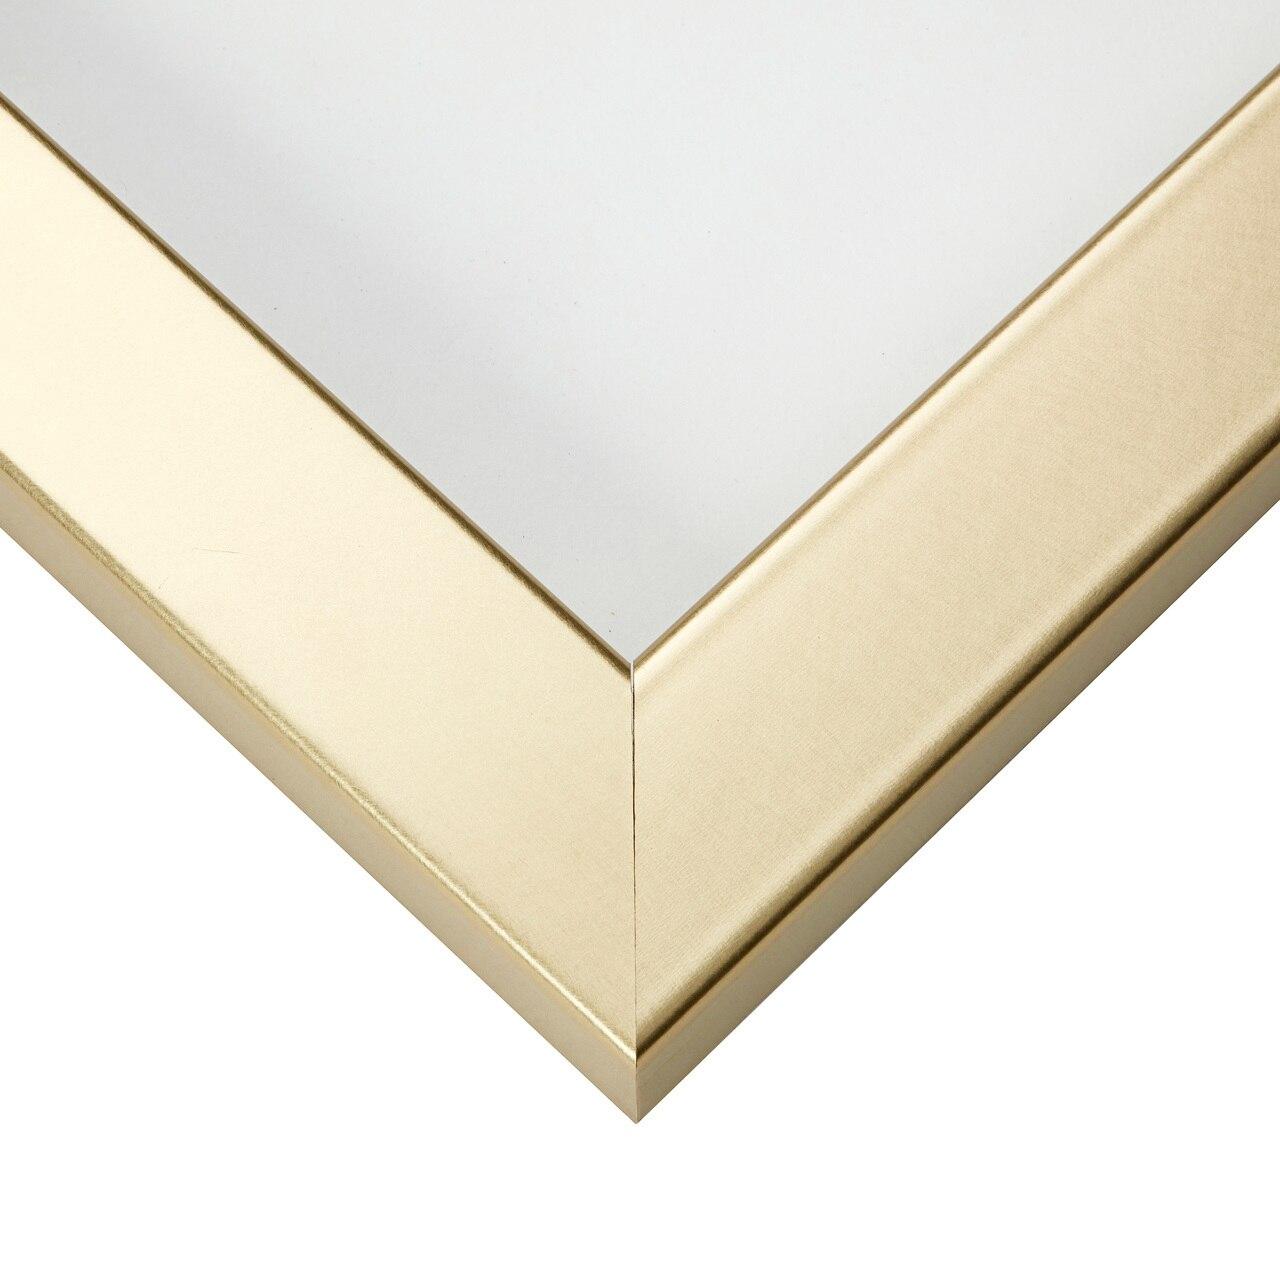 12x12 Inch Antique Gold Picture Frame 740661212 Bauhaus 2 Wide Craig Frames